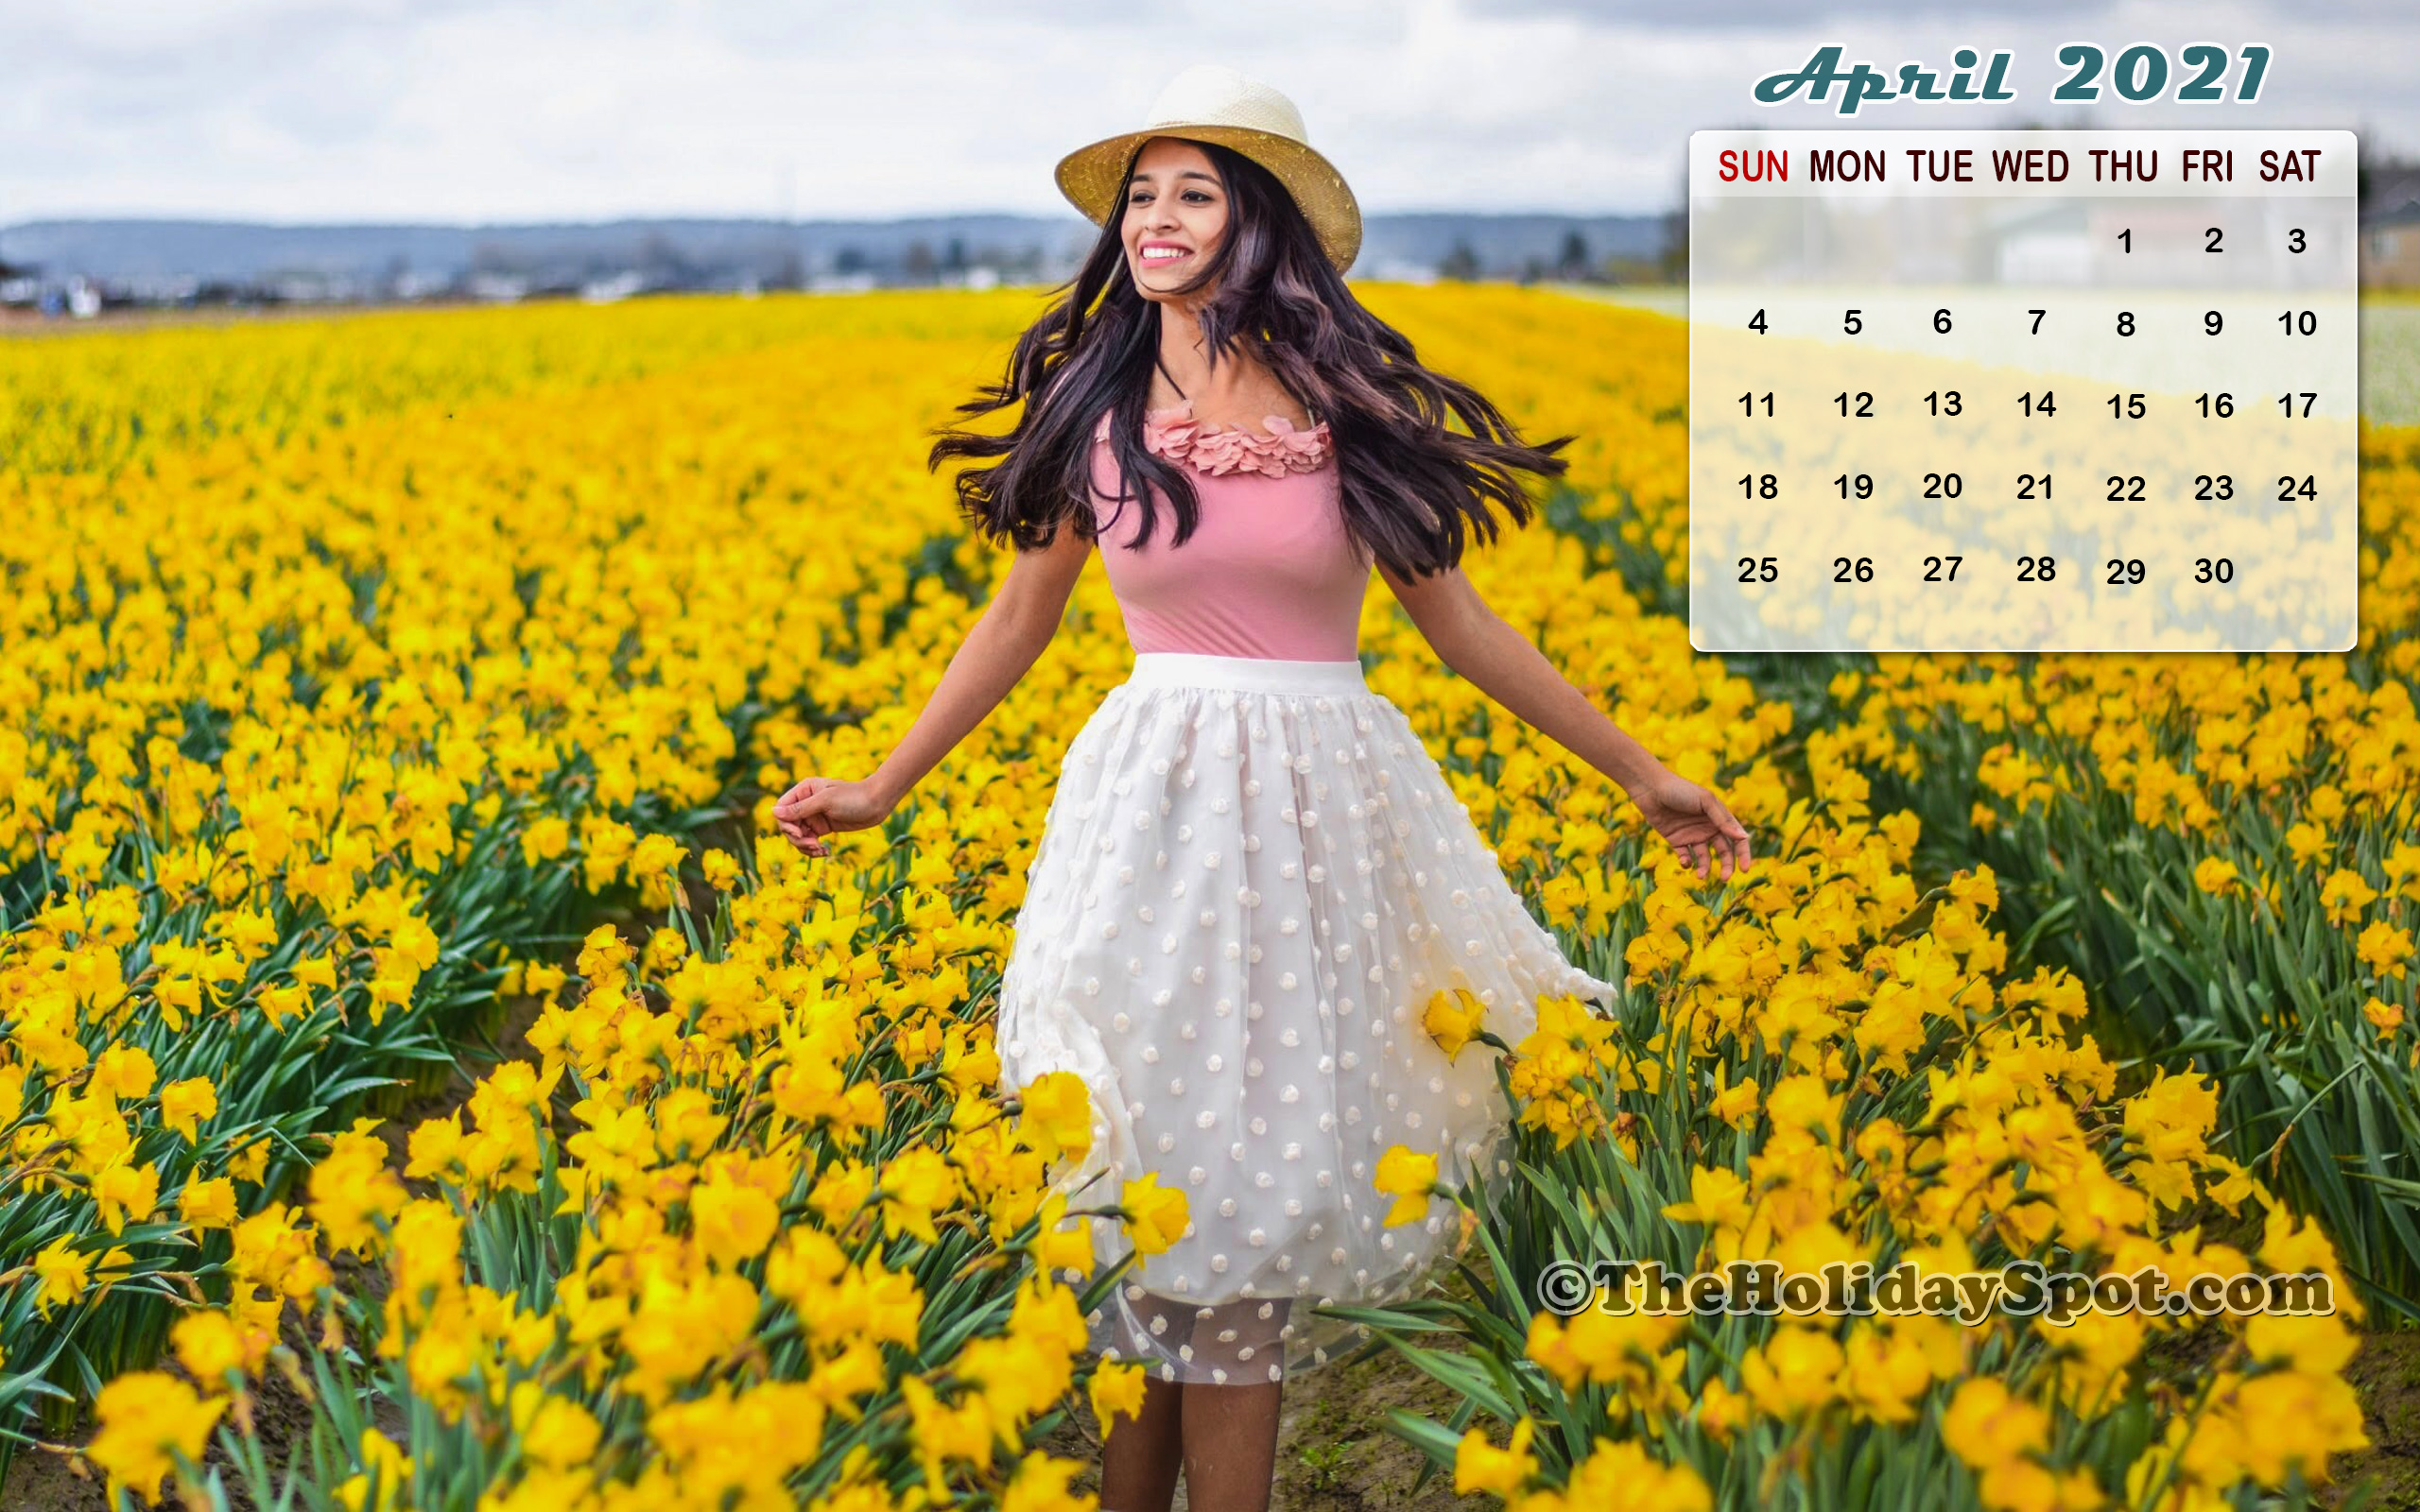 Month wise Calendar Wallpapers of 2021 1080p HD Calendar Wallpapers 2560x1600